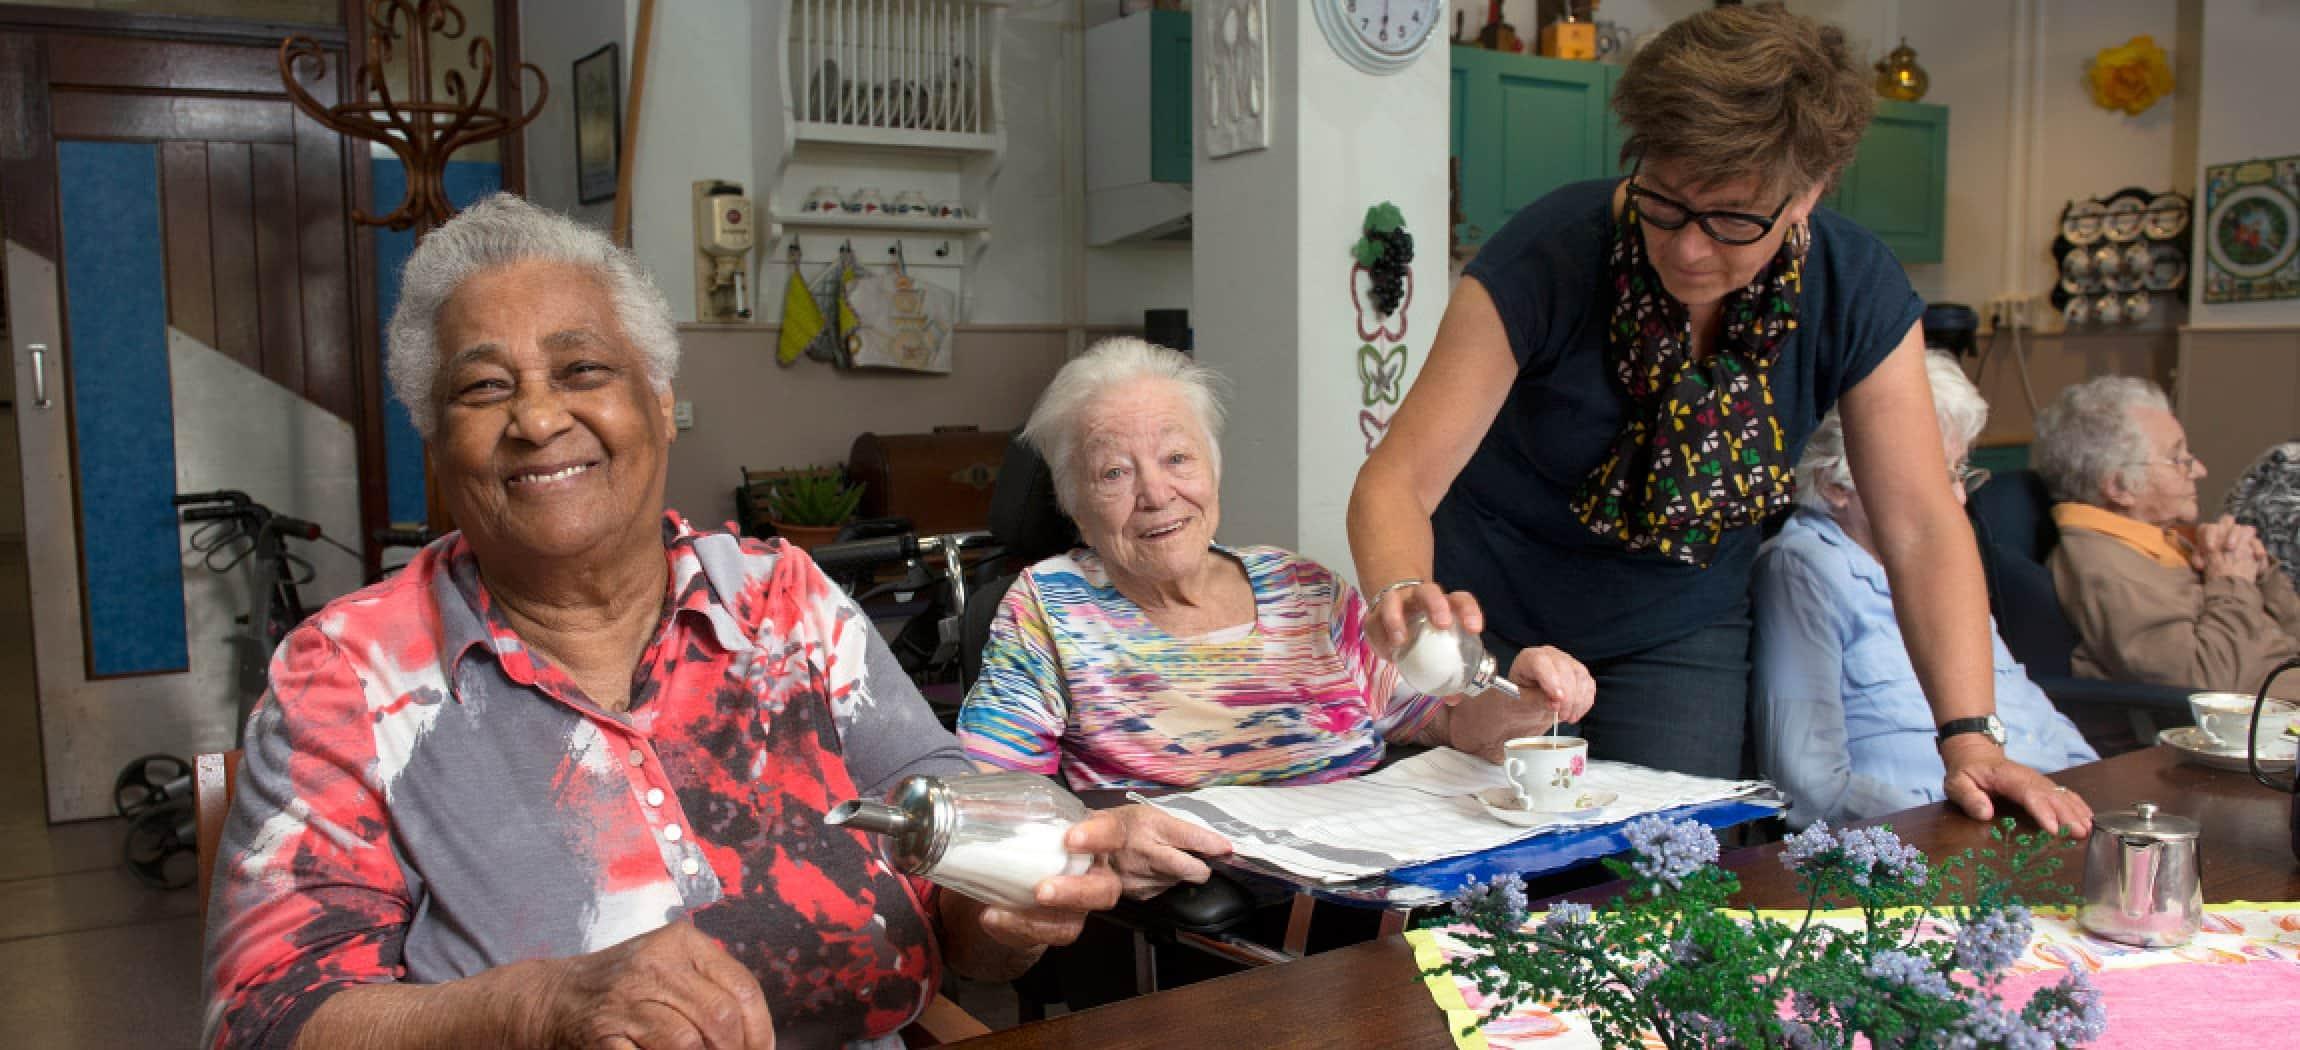 Lieve oude vrouwen aan gezellige tafel met koffie en knutselwerk